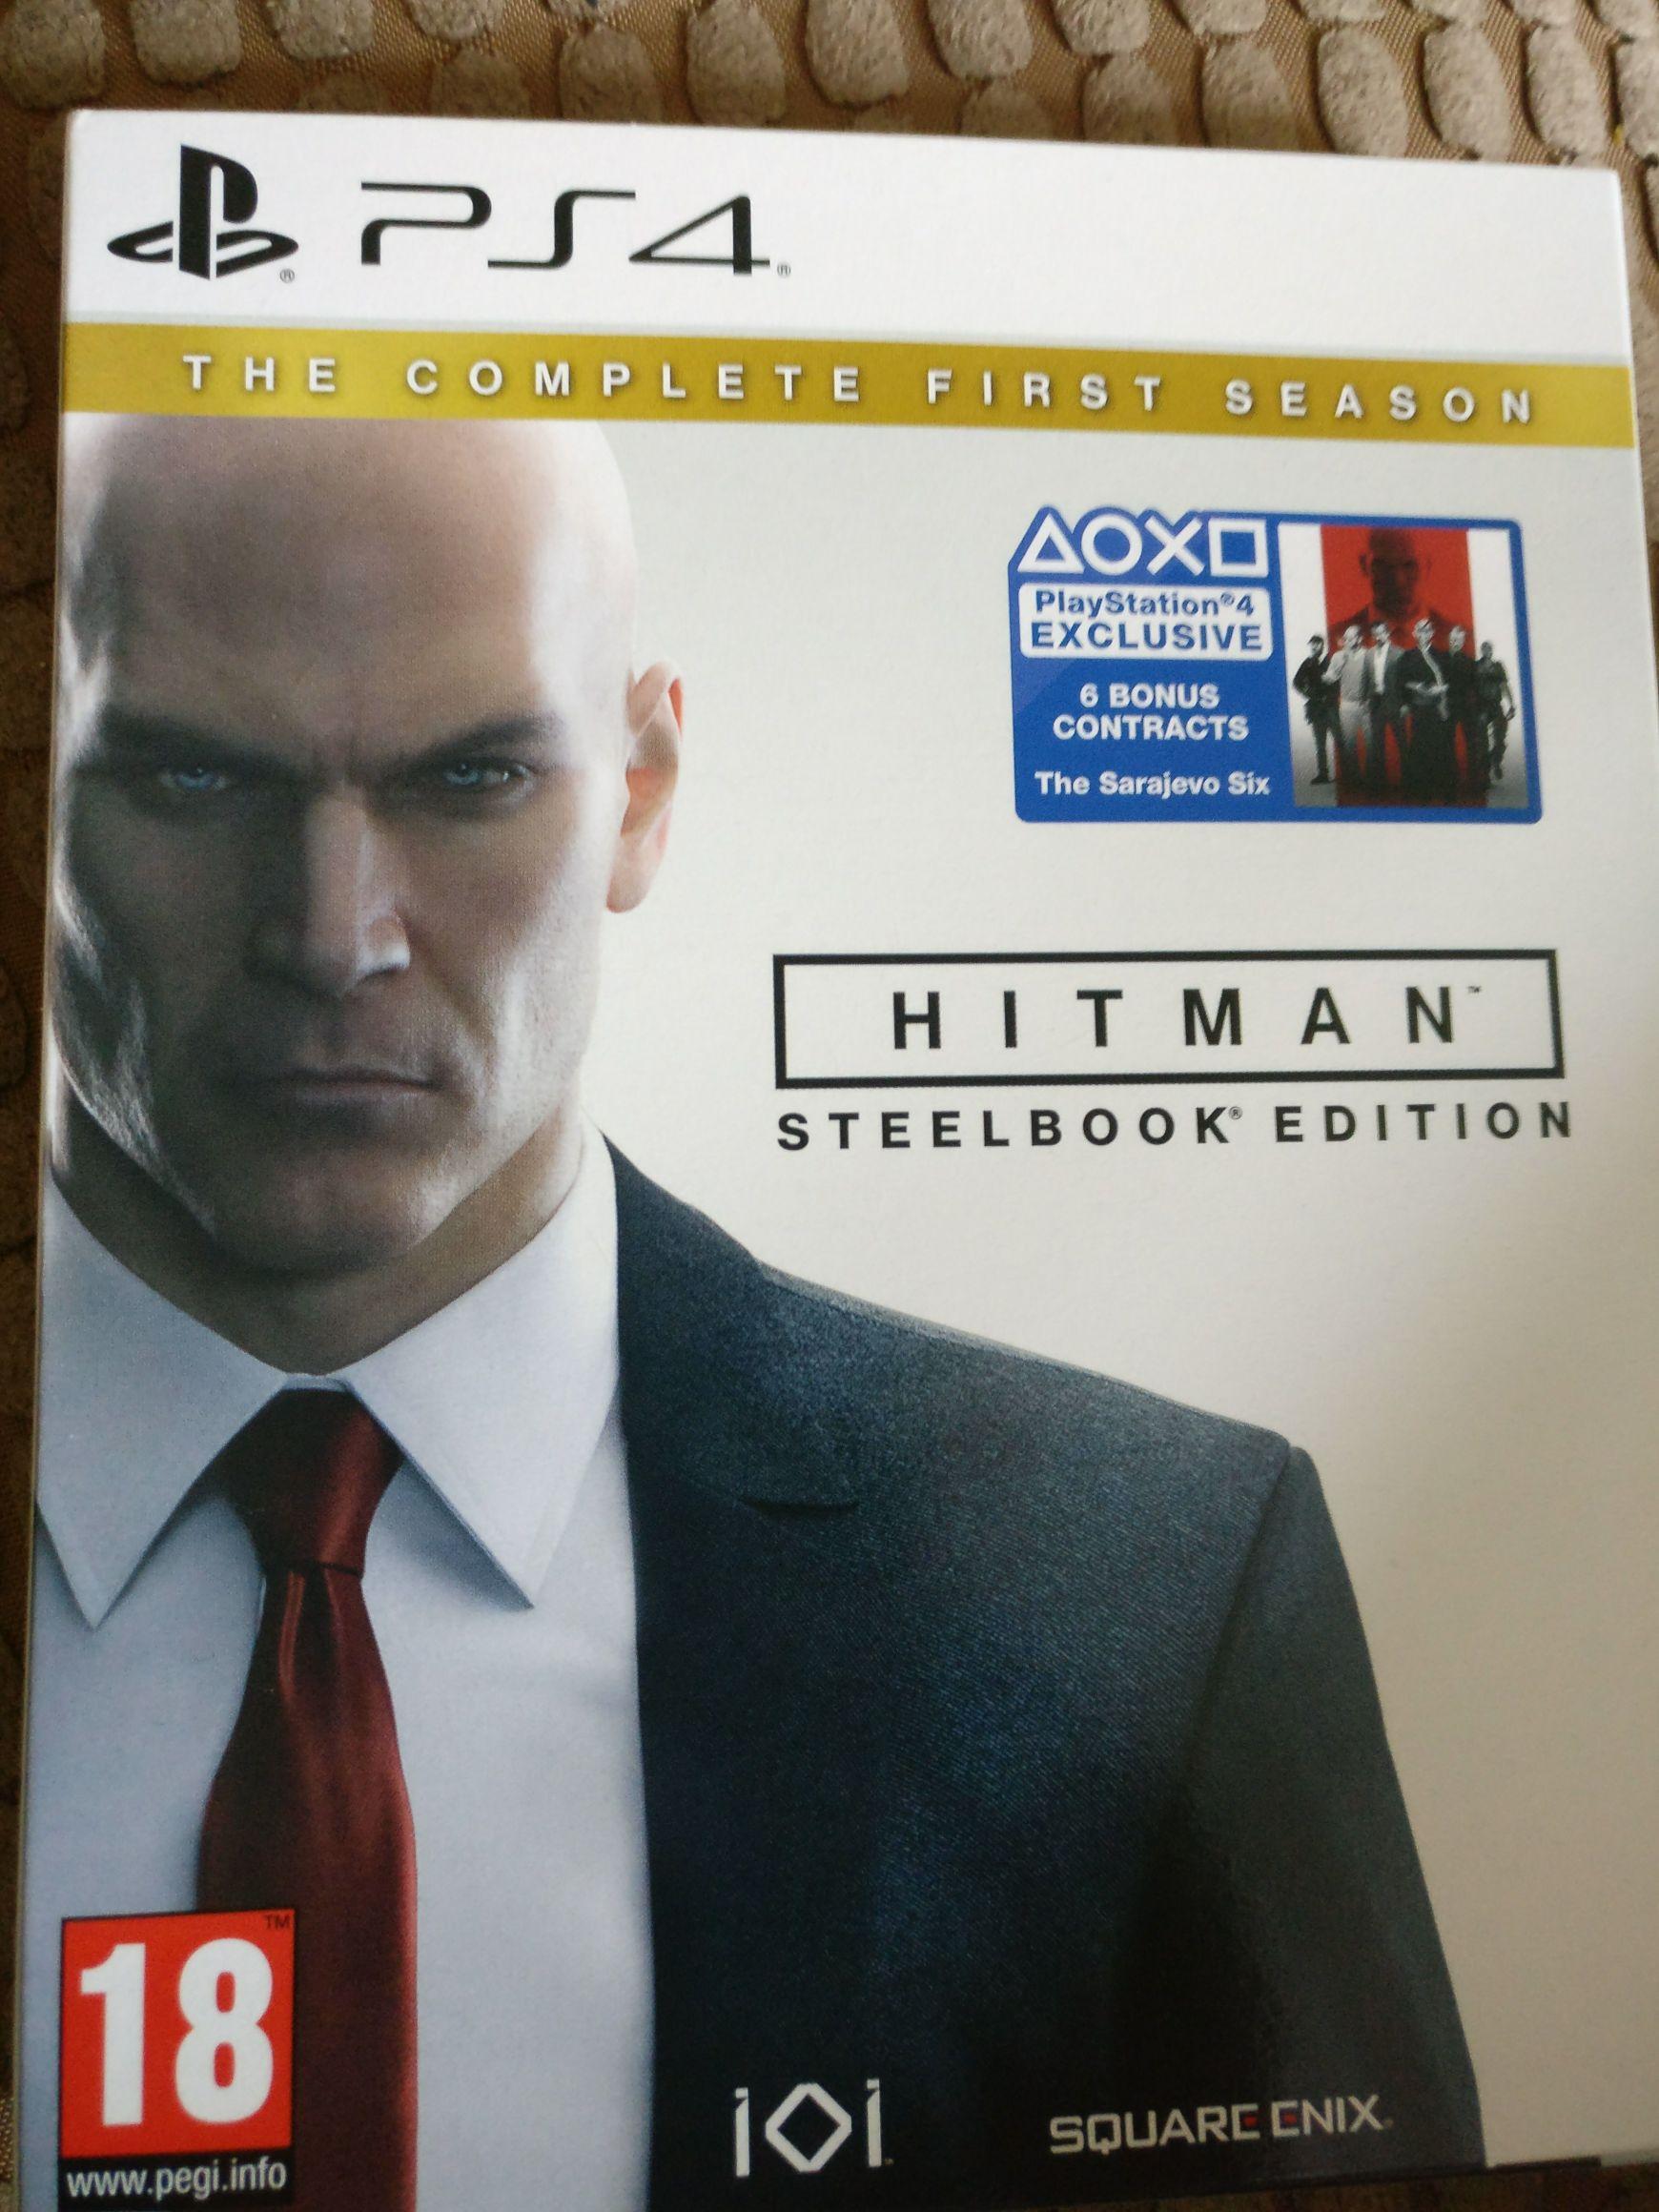 Hitman Steelbook edition - £5 instore @ Smyths Toys